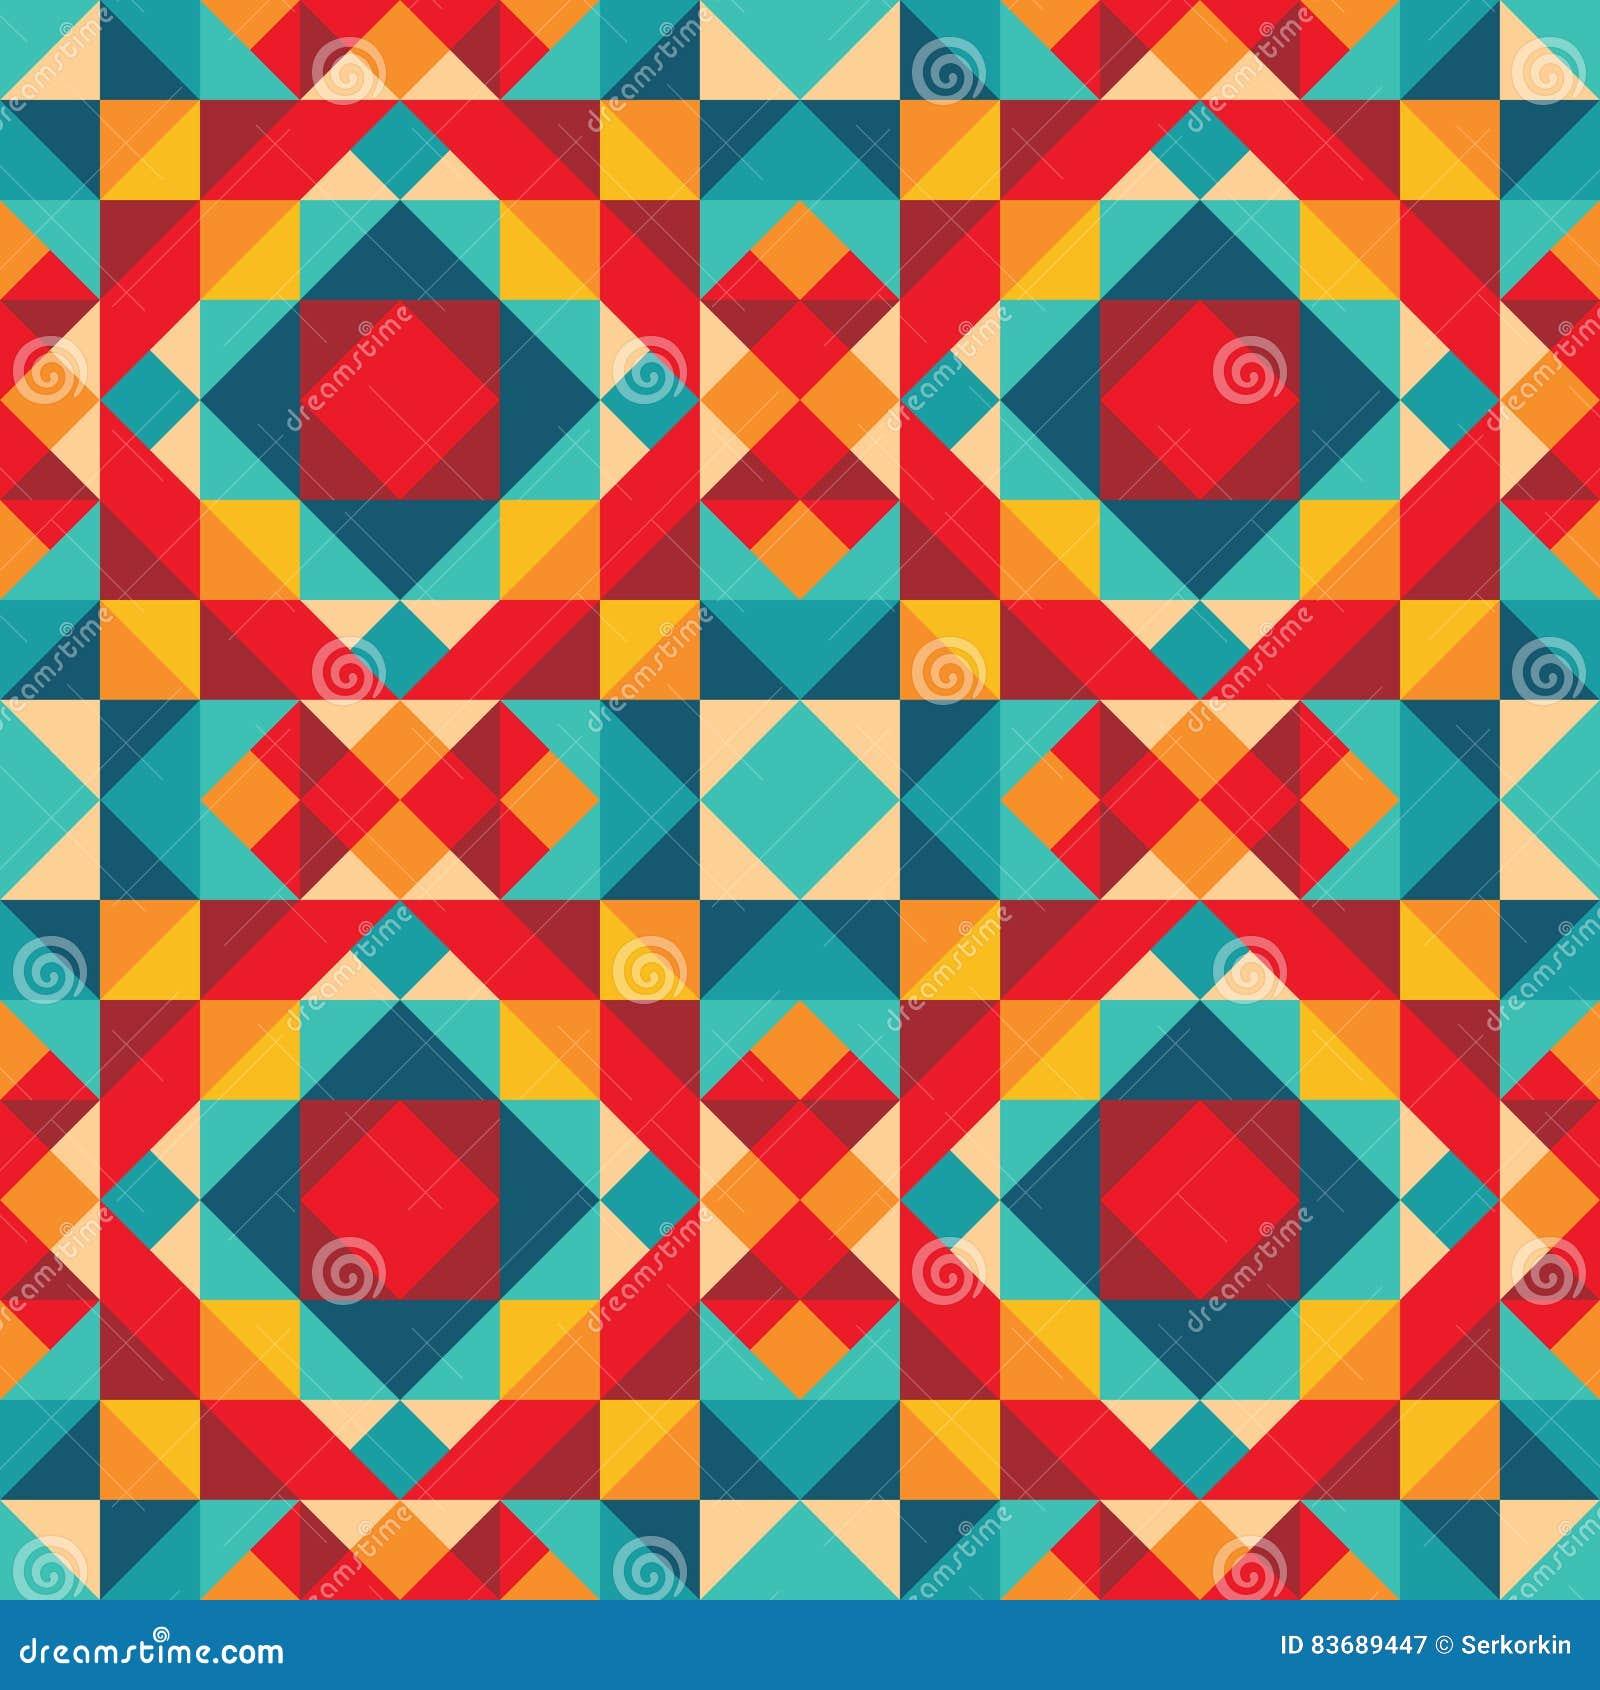 geometric yellow background illustration - photo #21